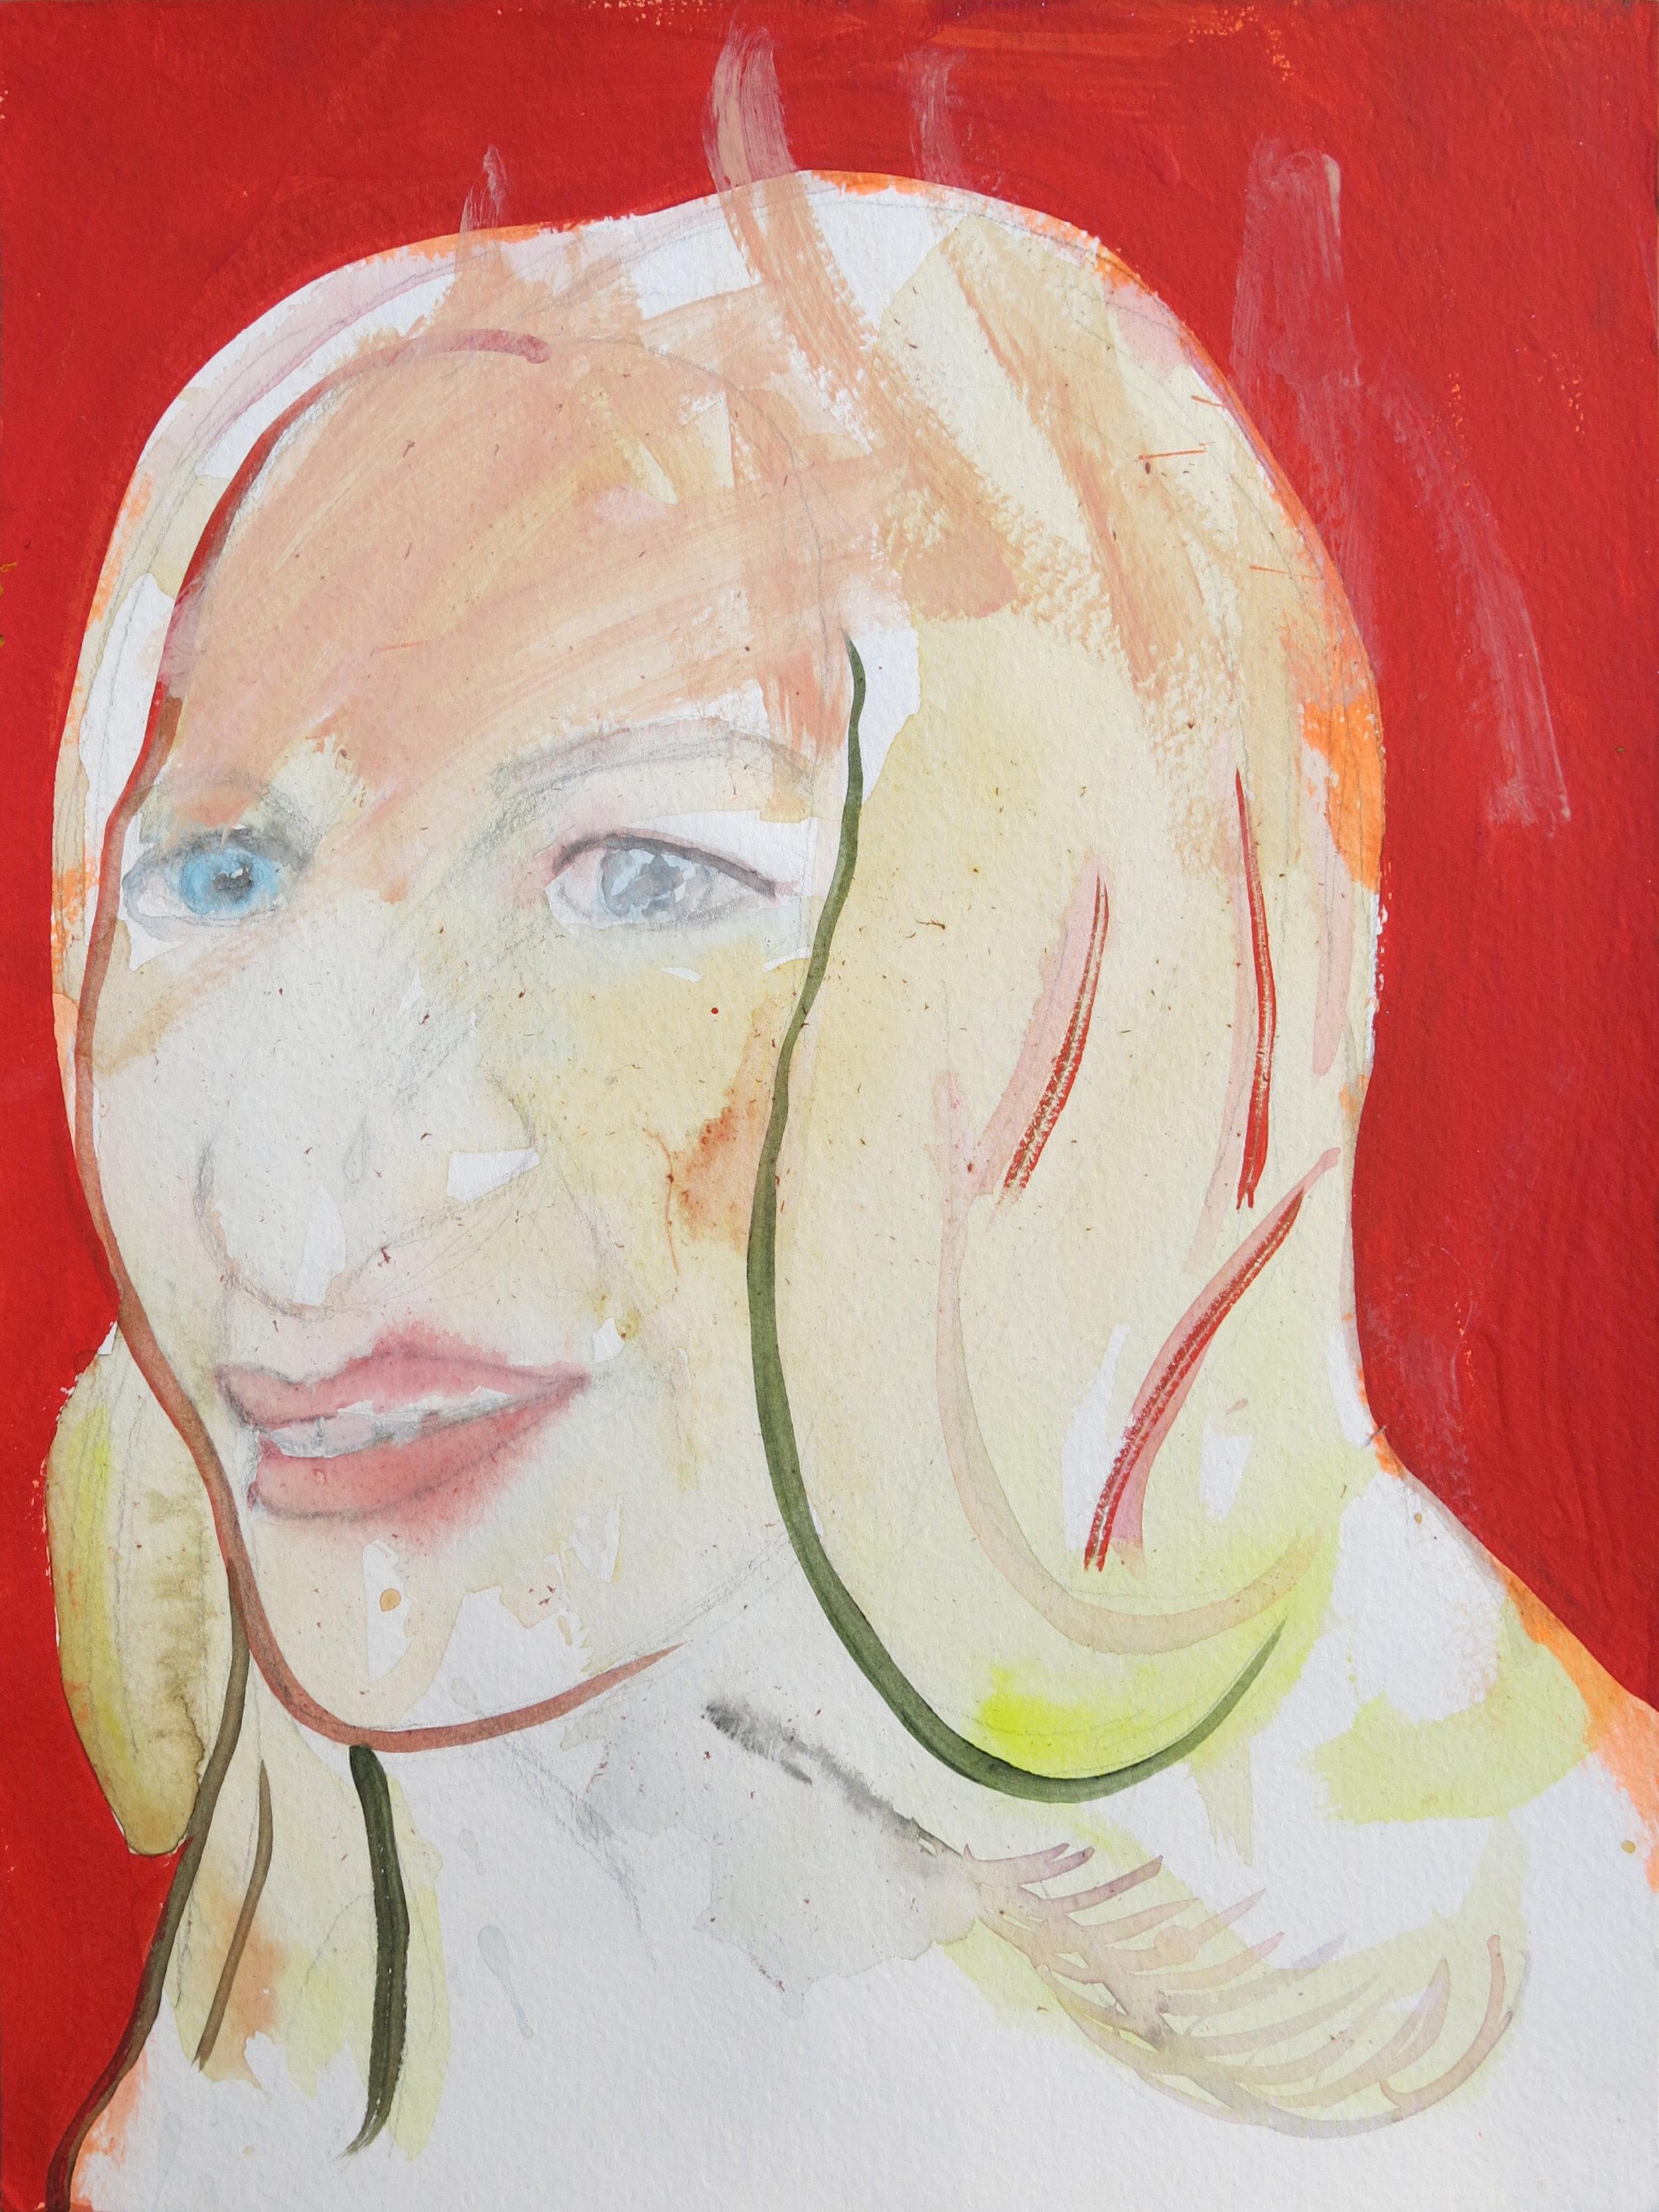 Barbra Streisand Portrait #55